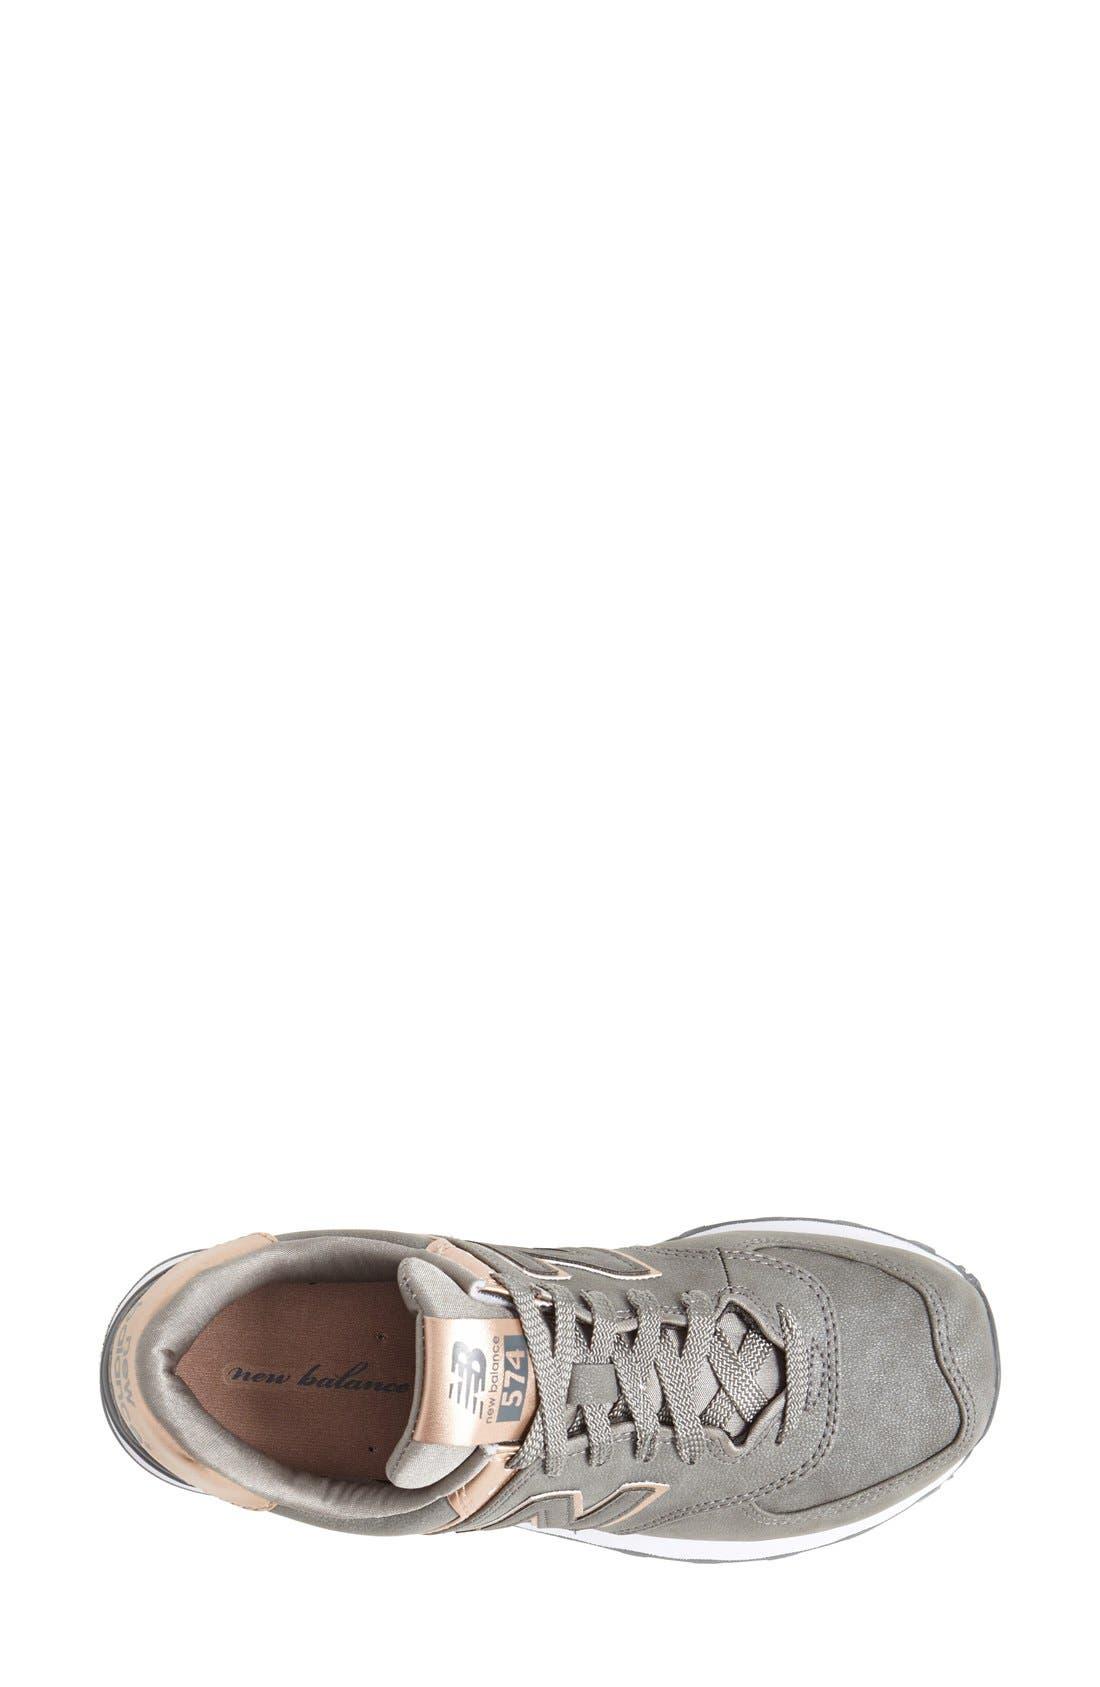 '574 - Precious Metals' Sneaker,                             Alternate thumbnail 4, color,                             040